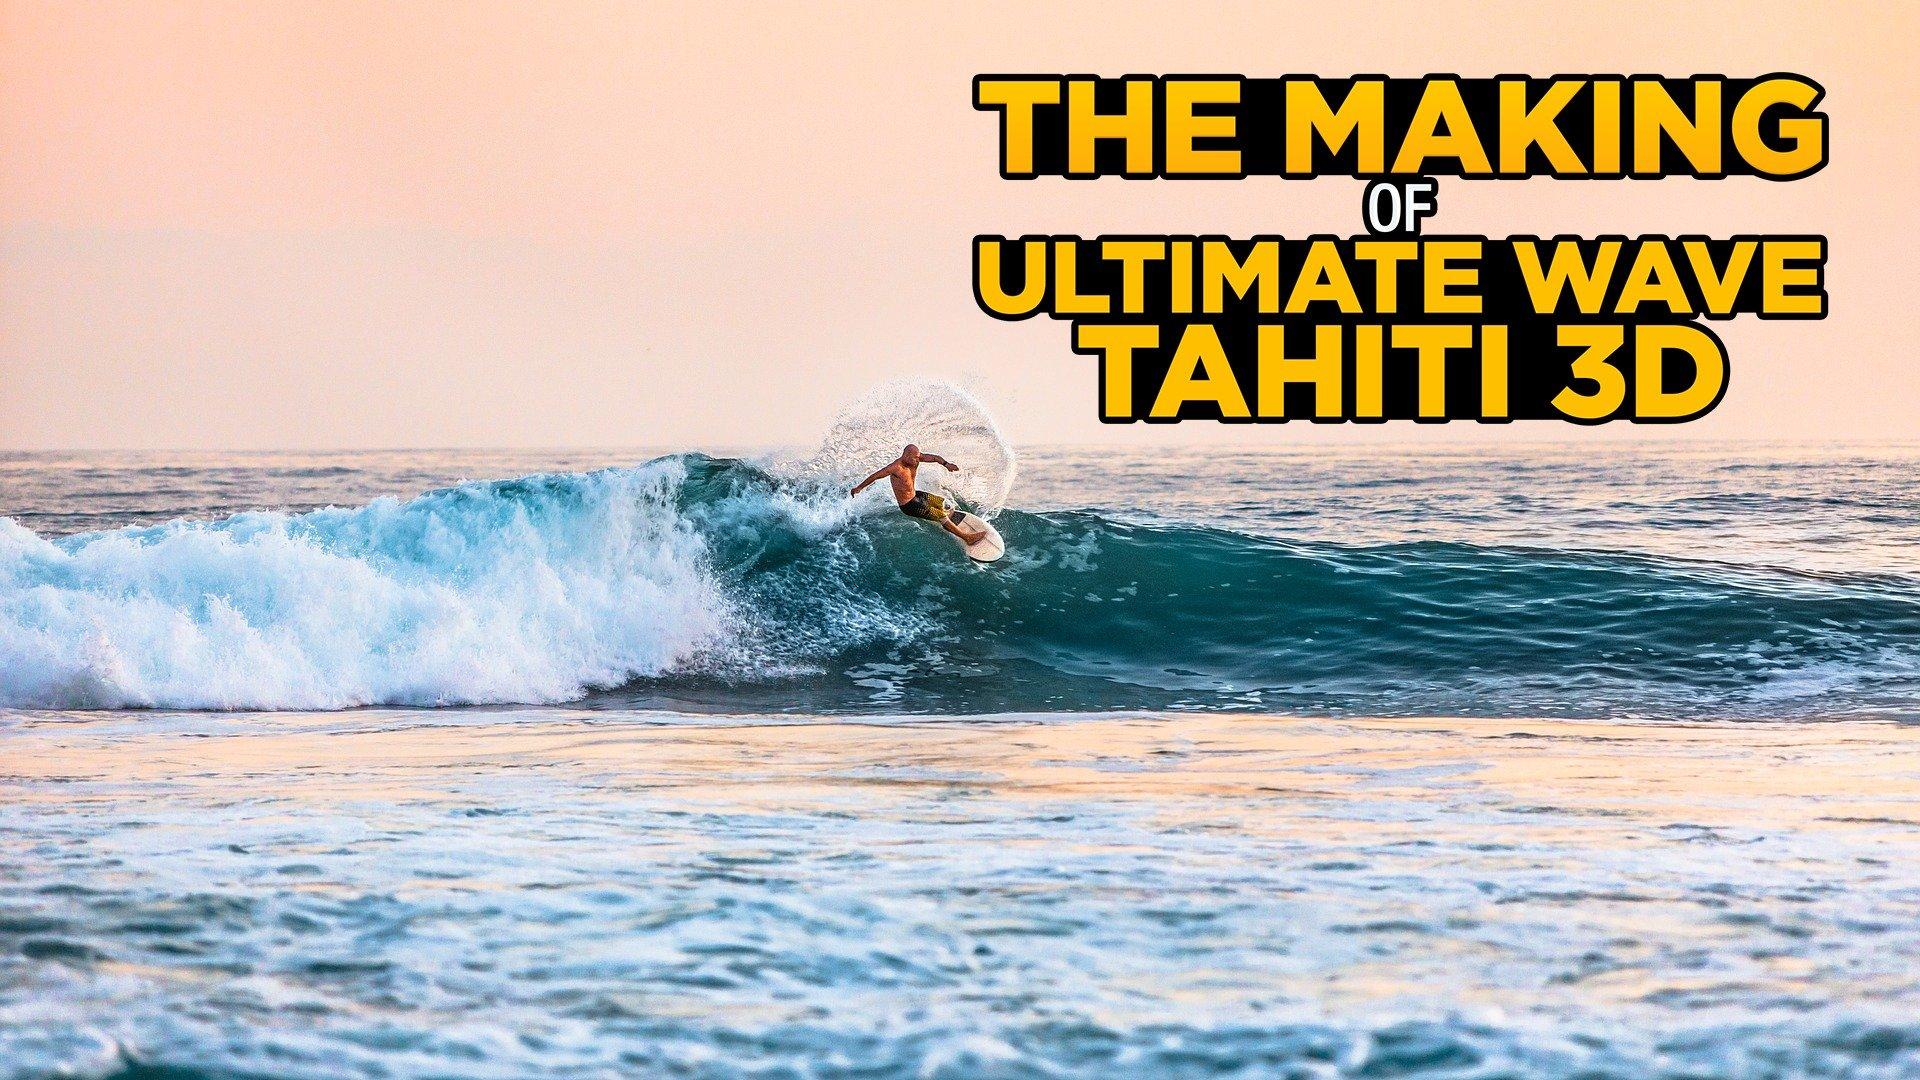 The Making of Ultimate Wave Tahiti 3D